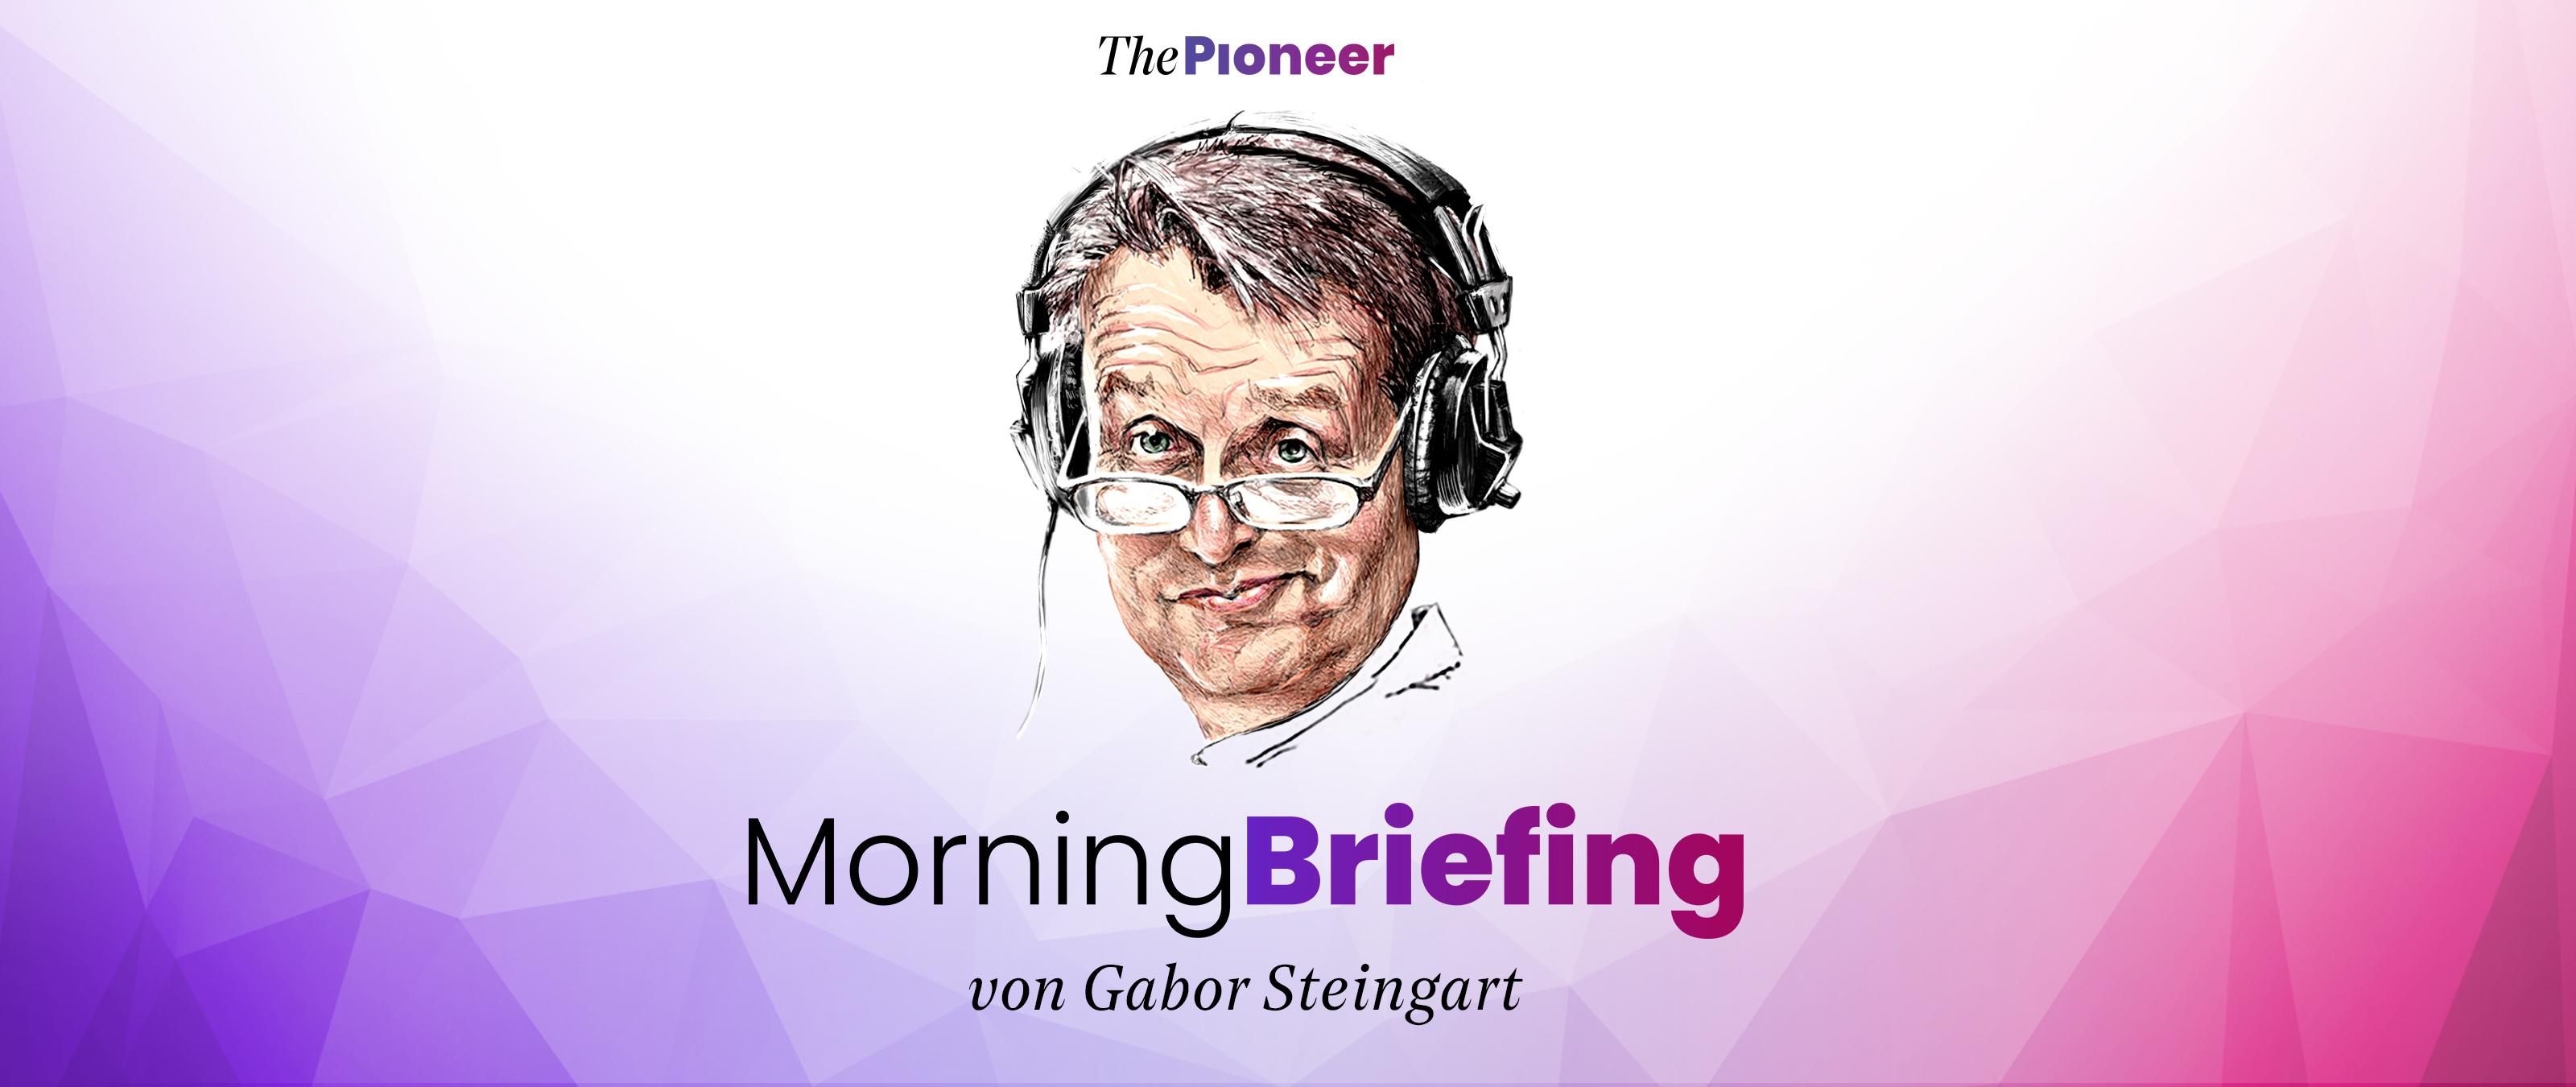 Newsletter Header Morning Briefing